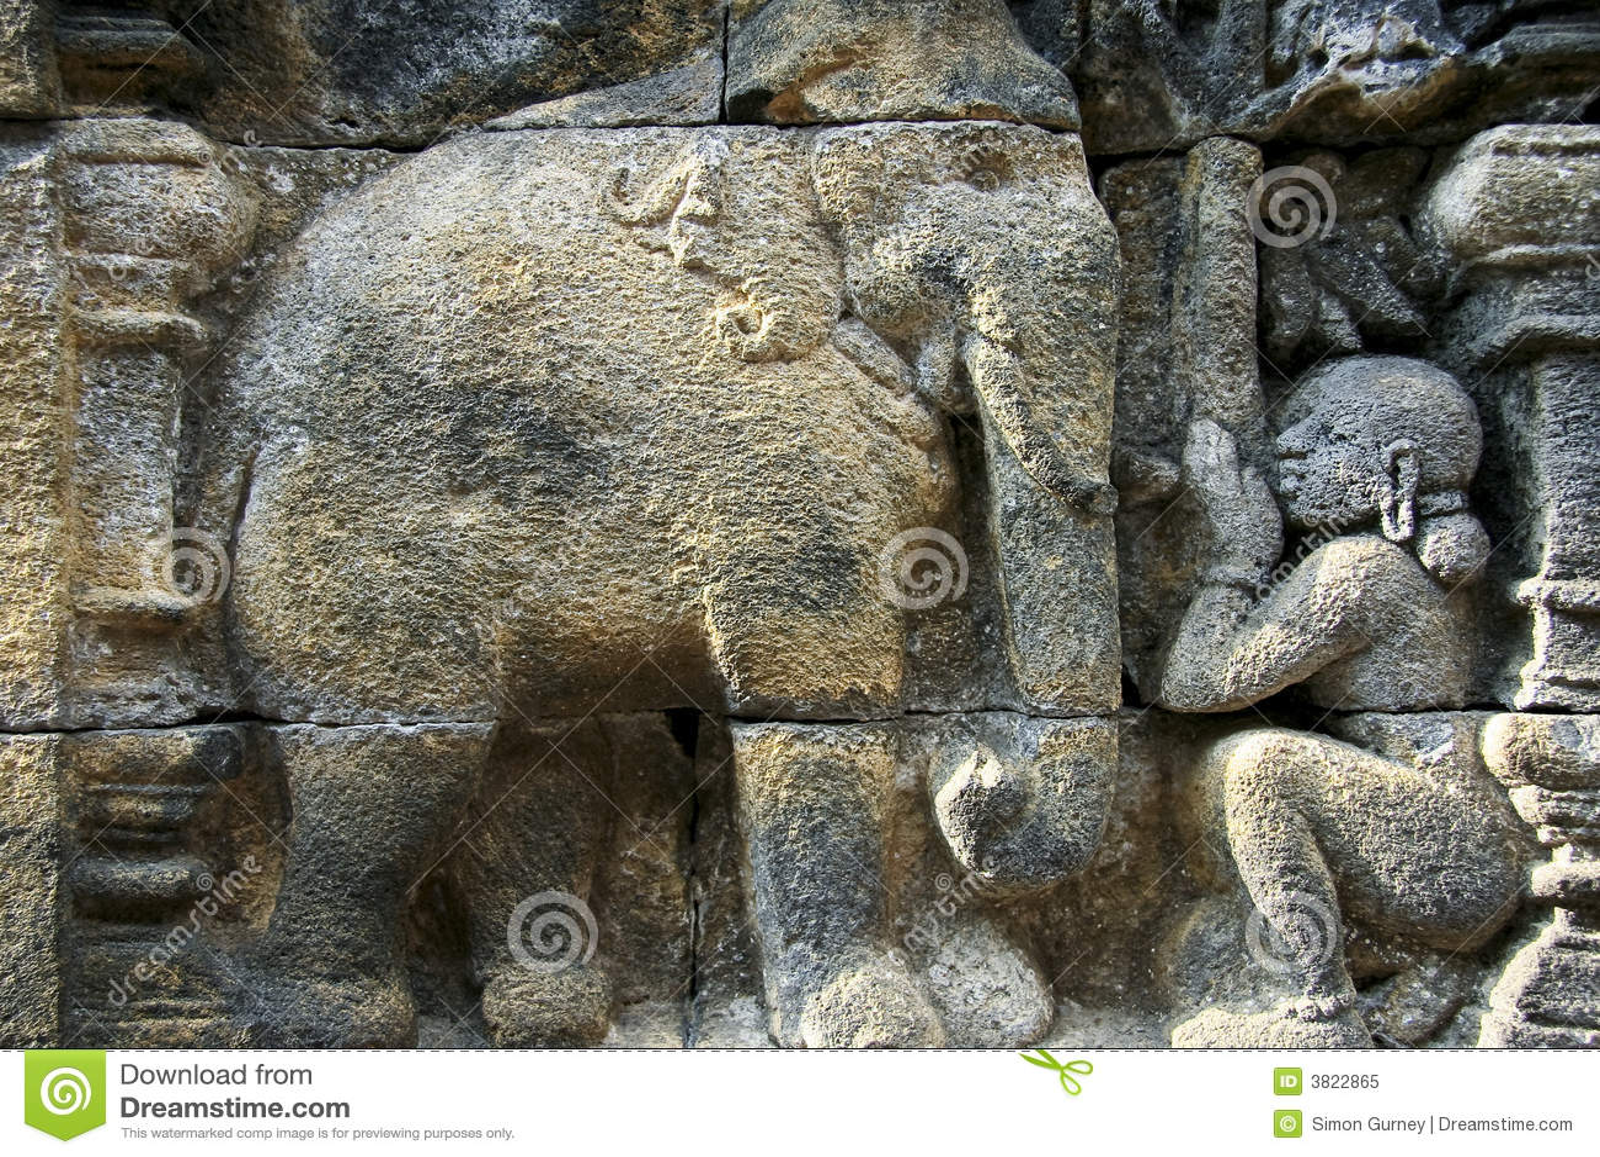 Borobudur temple ancient wall art elephant royalty free